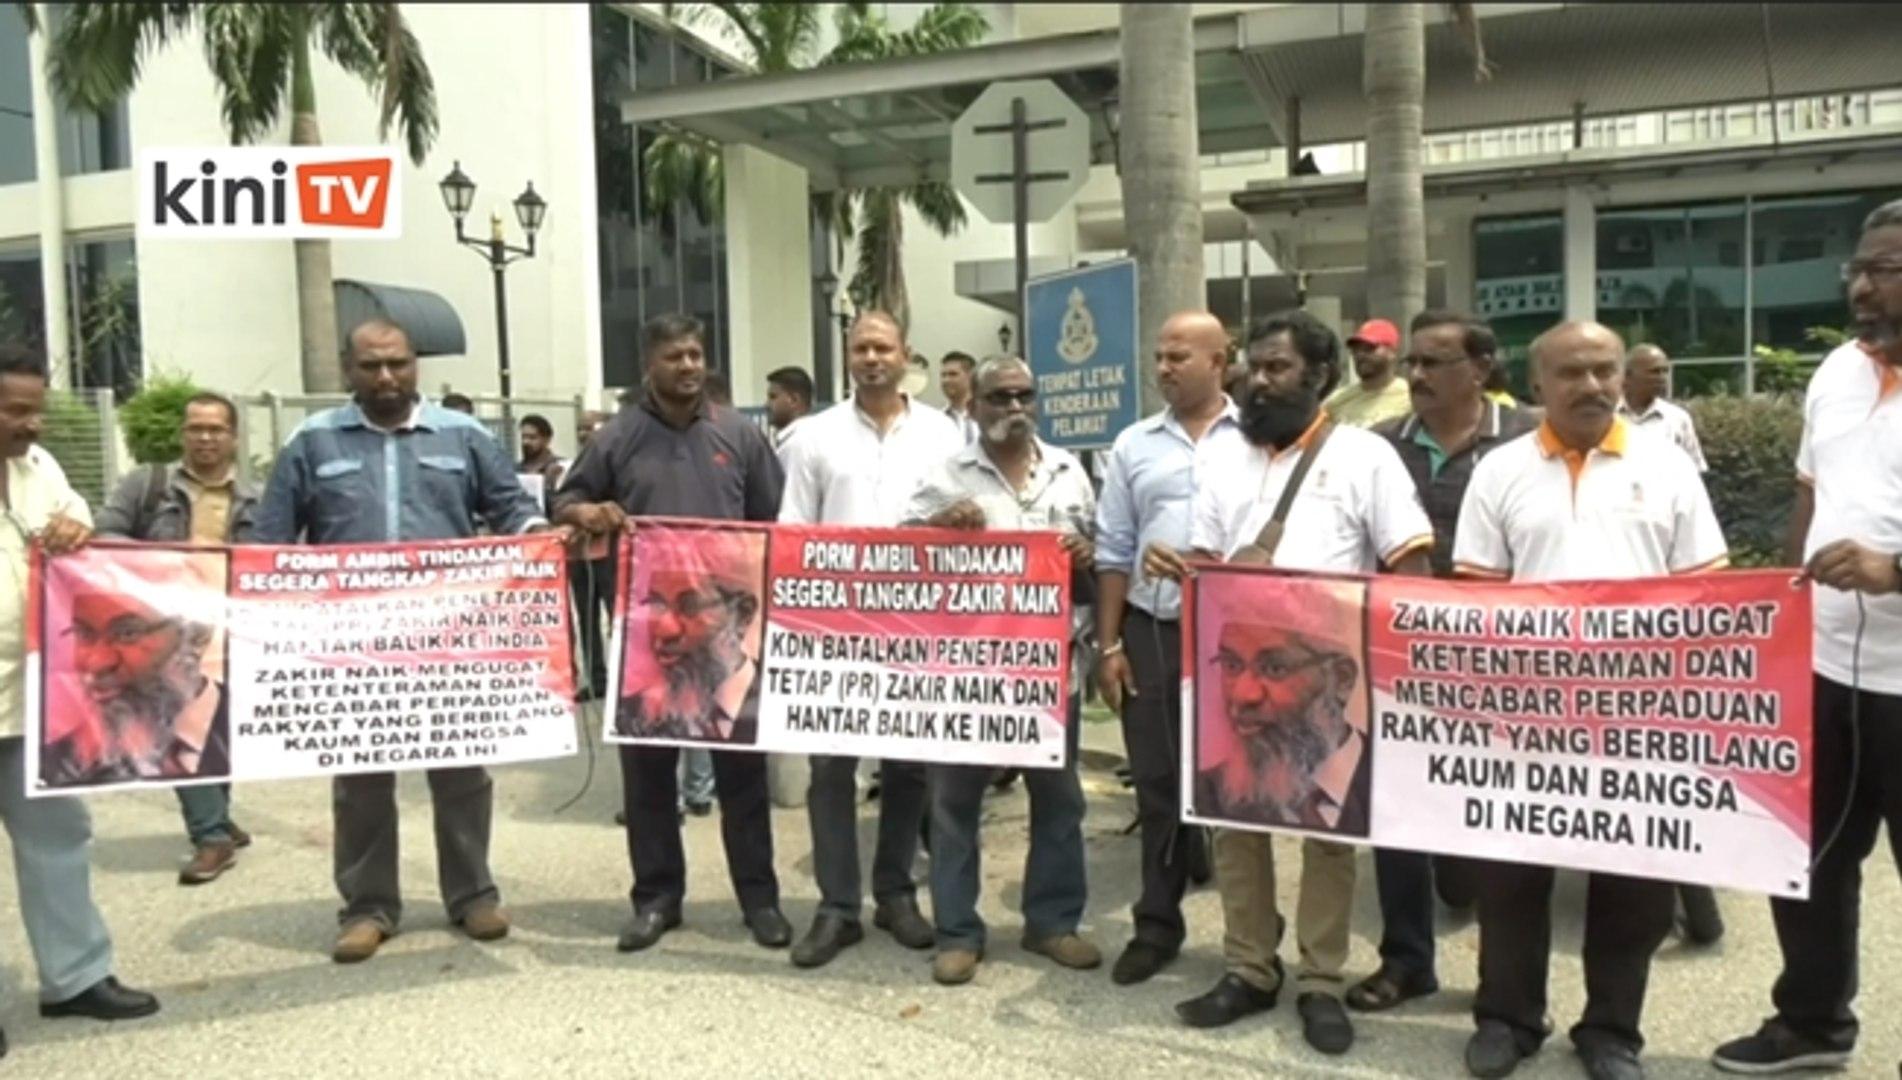 Lagi NGO bantah Zakir Naik